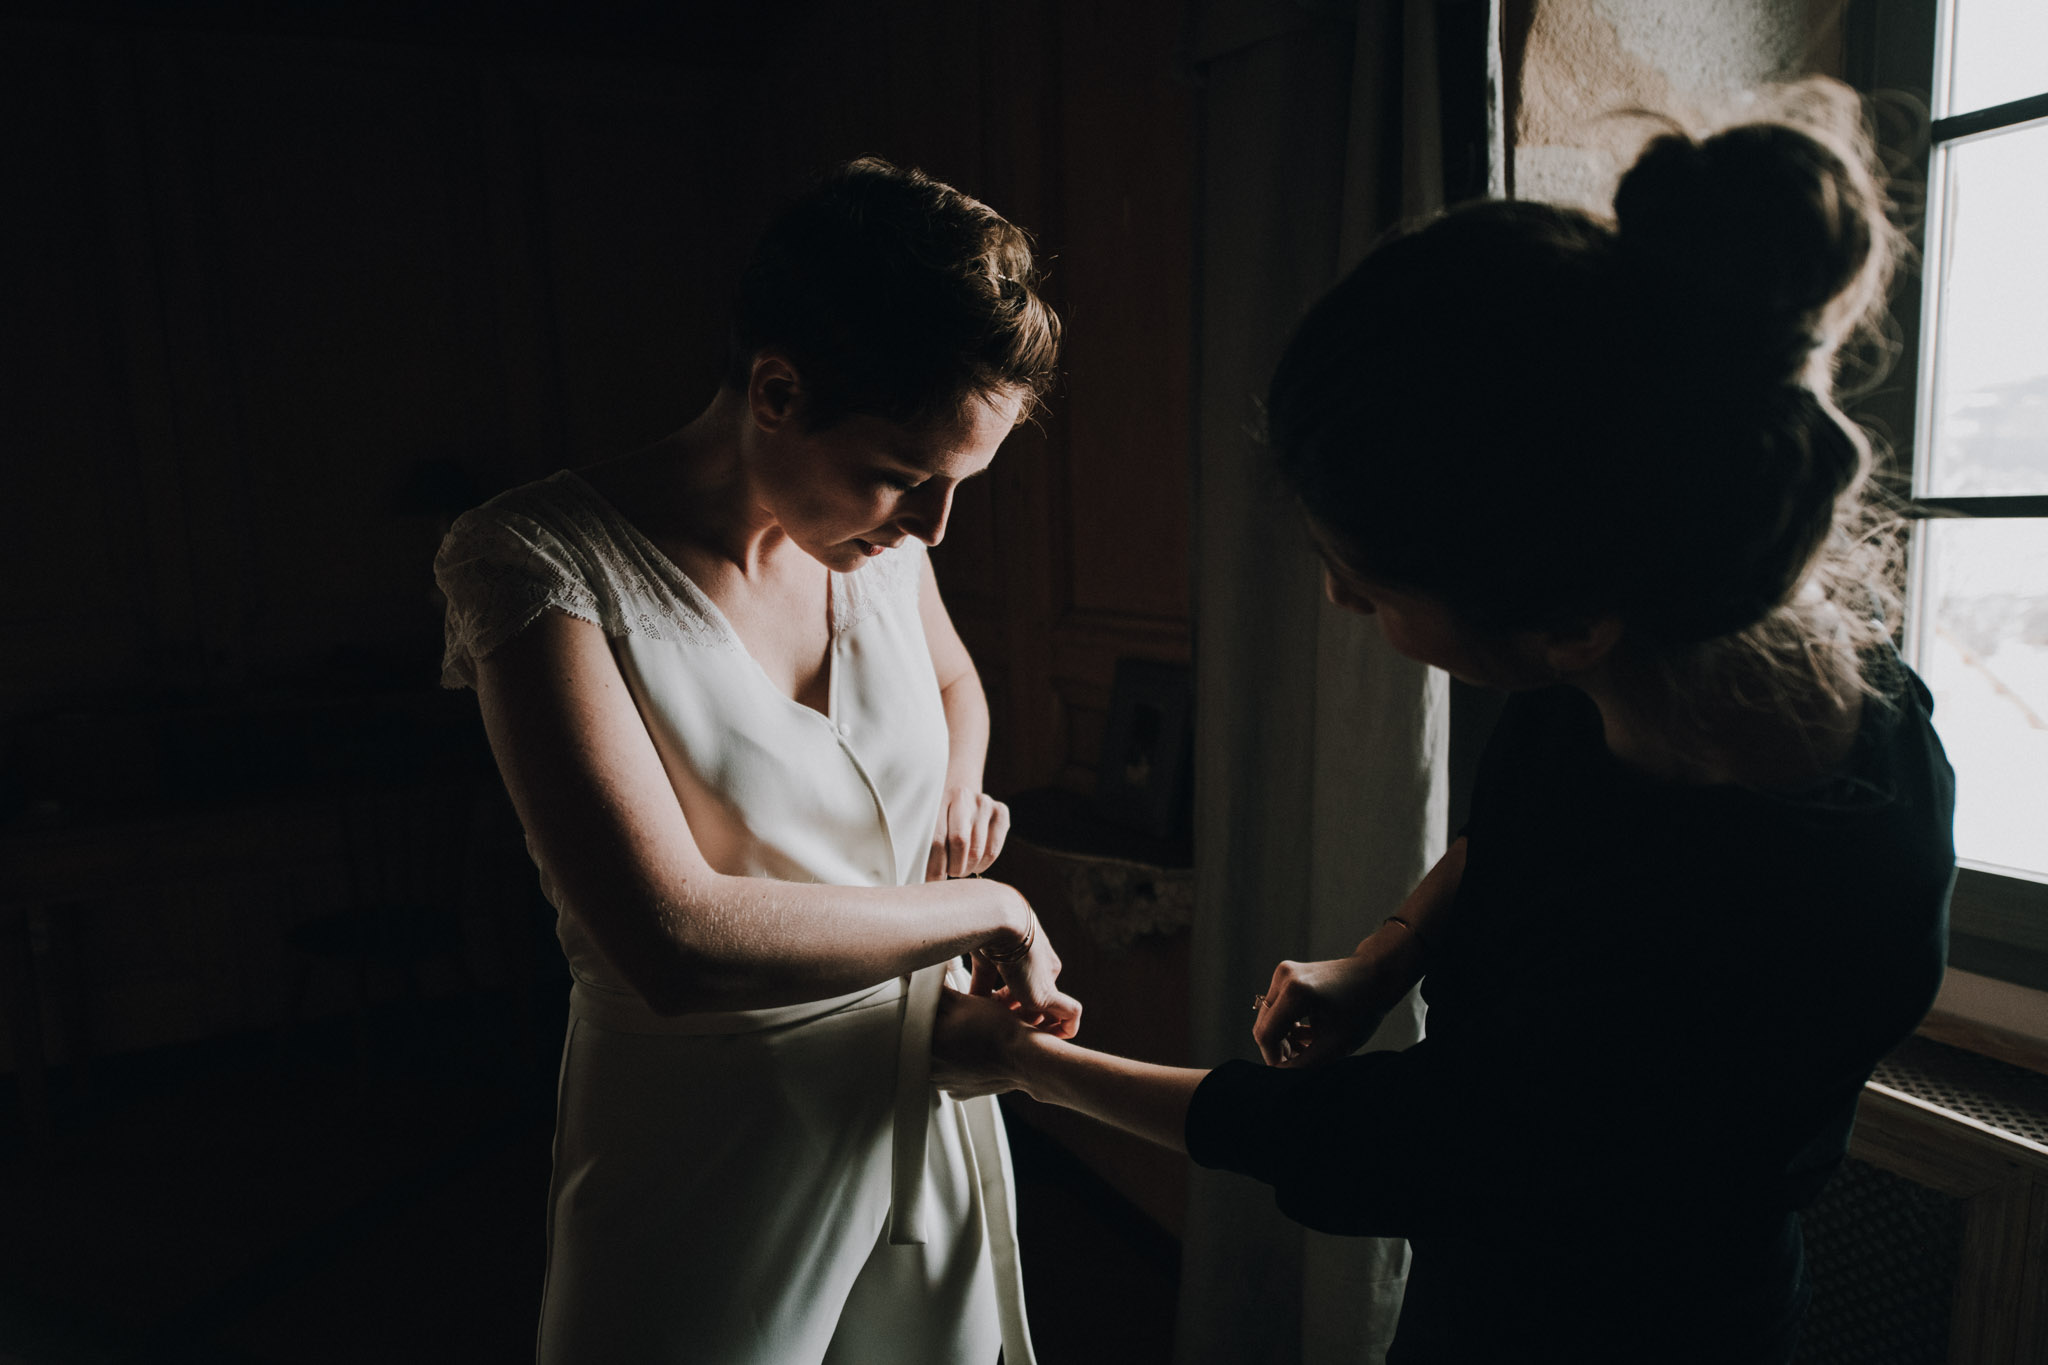 2018-02-03 - LD8_4395 - photographe - mariage - www.lauriediazwedding.com.jpg